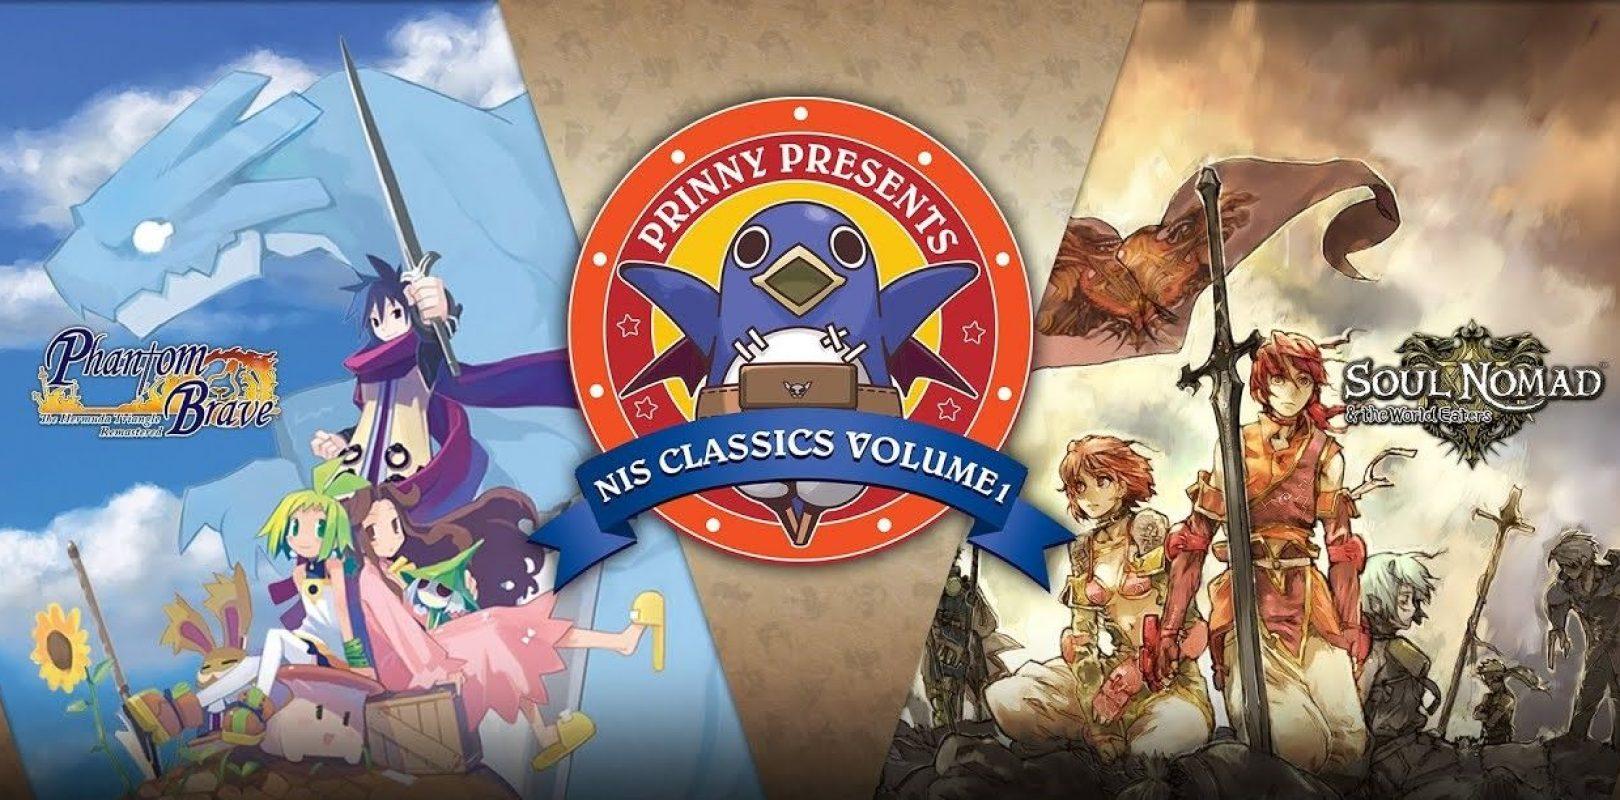 Prinny Presents NIS Classics Volume 1 sur jdrpg.fr